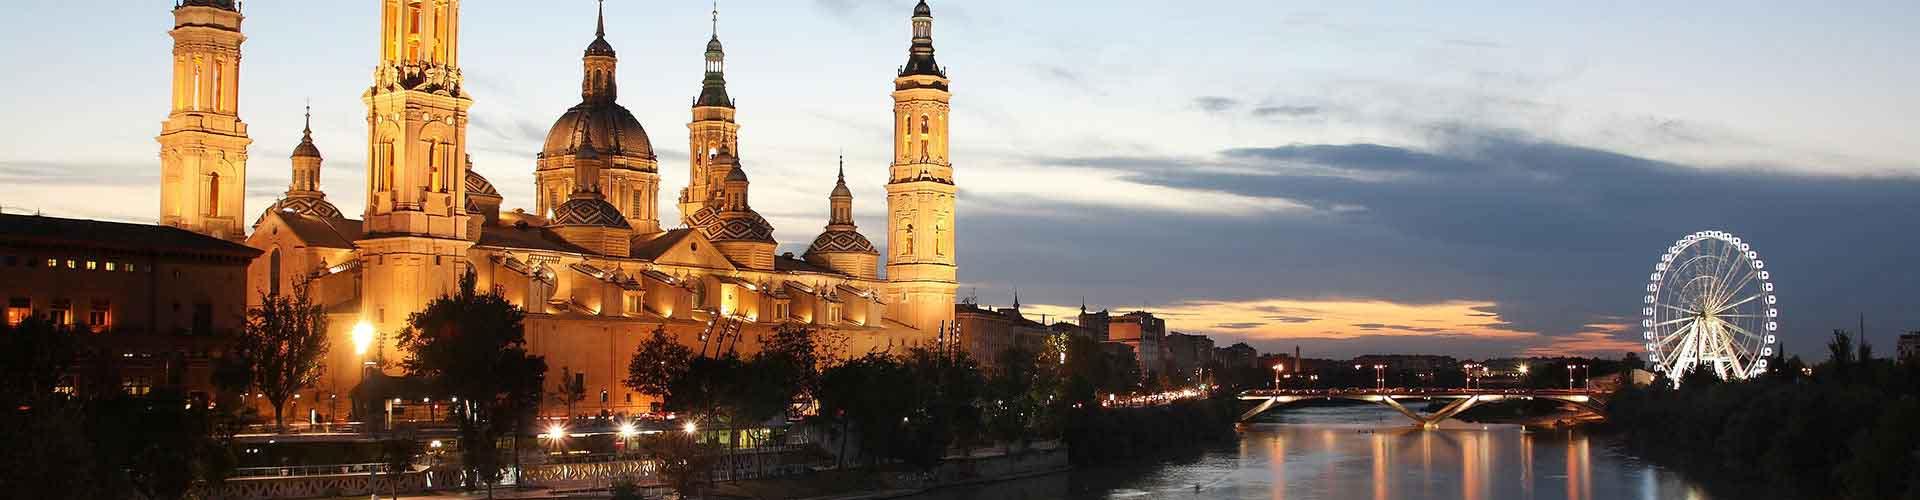 Zaragoza - Appartements dans le quartier de Casco Antiguo. Cartes pour Zaragoza, photos et commentaires pour chaque appartement à Zaragoza.